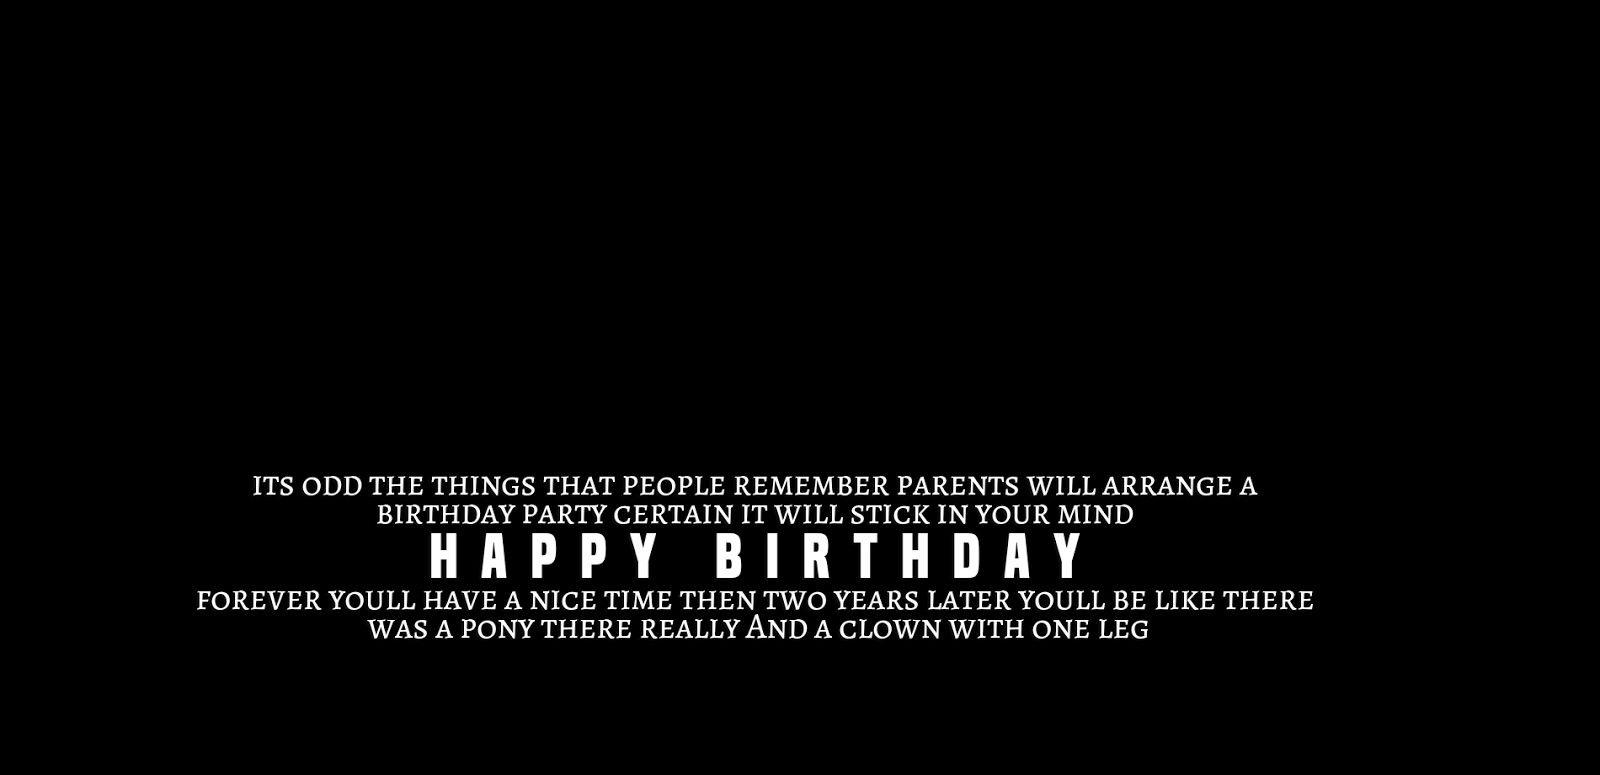 Pin By Rupesh On Love Birthday Raaj Png Happy Birthday Png Happy Birthday Text Birthday Text